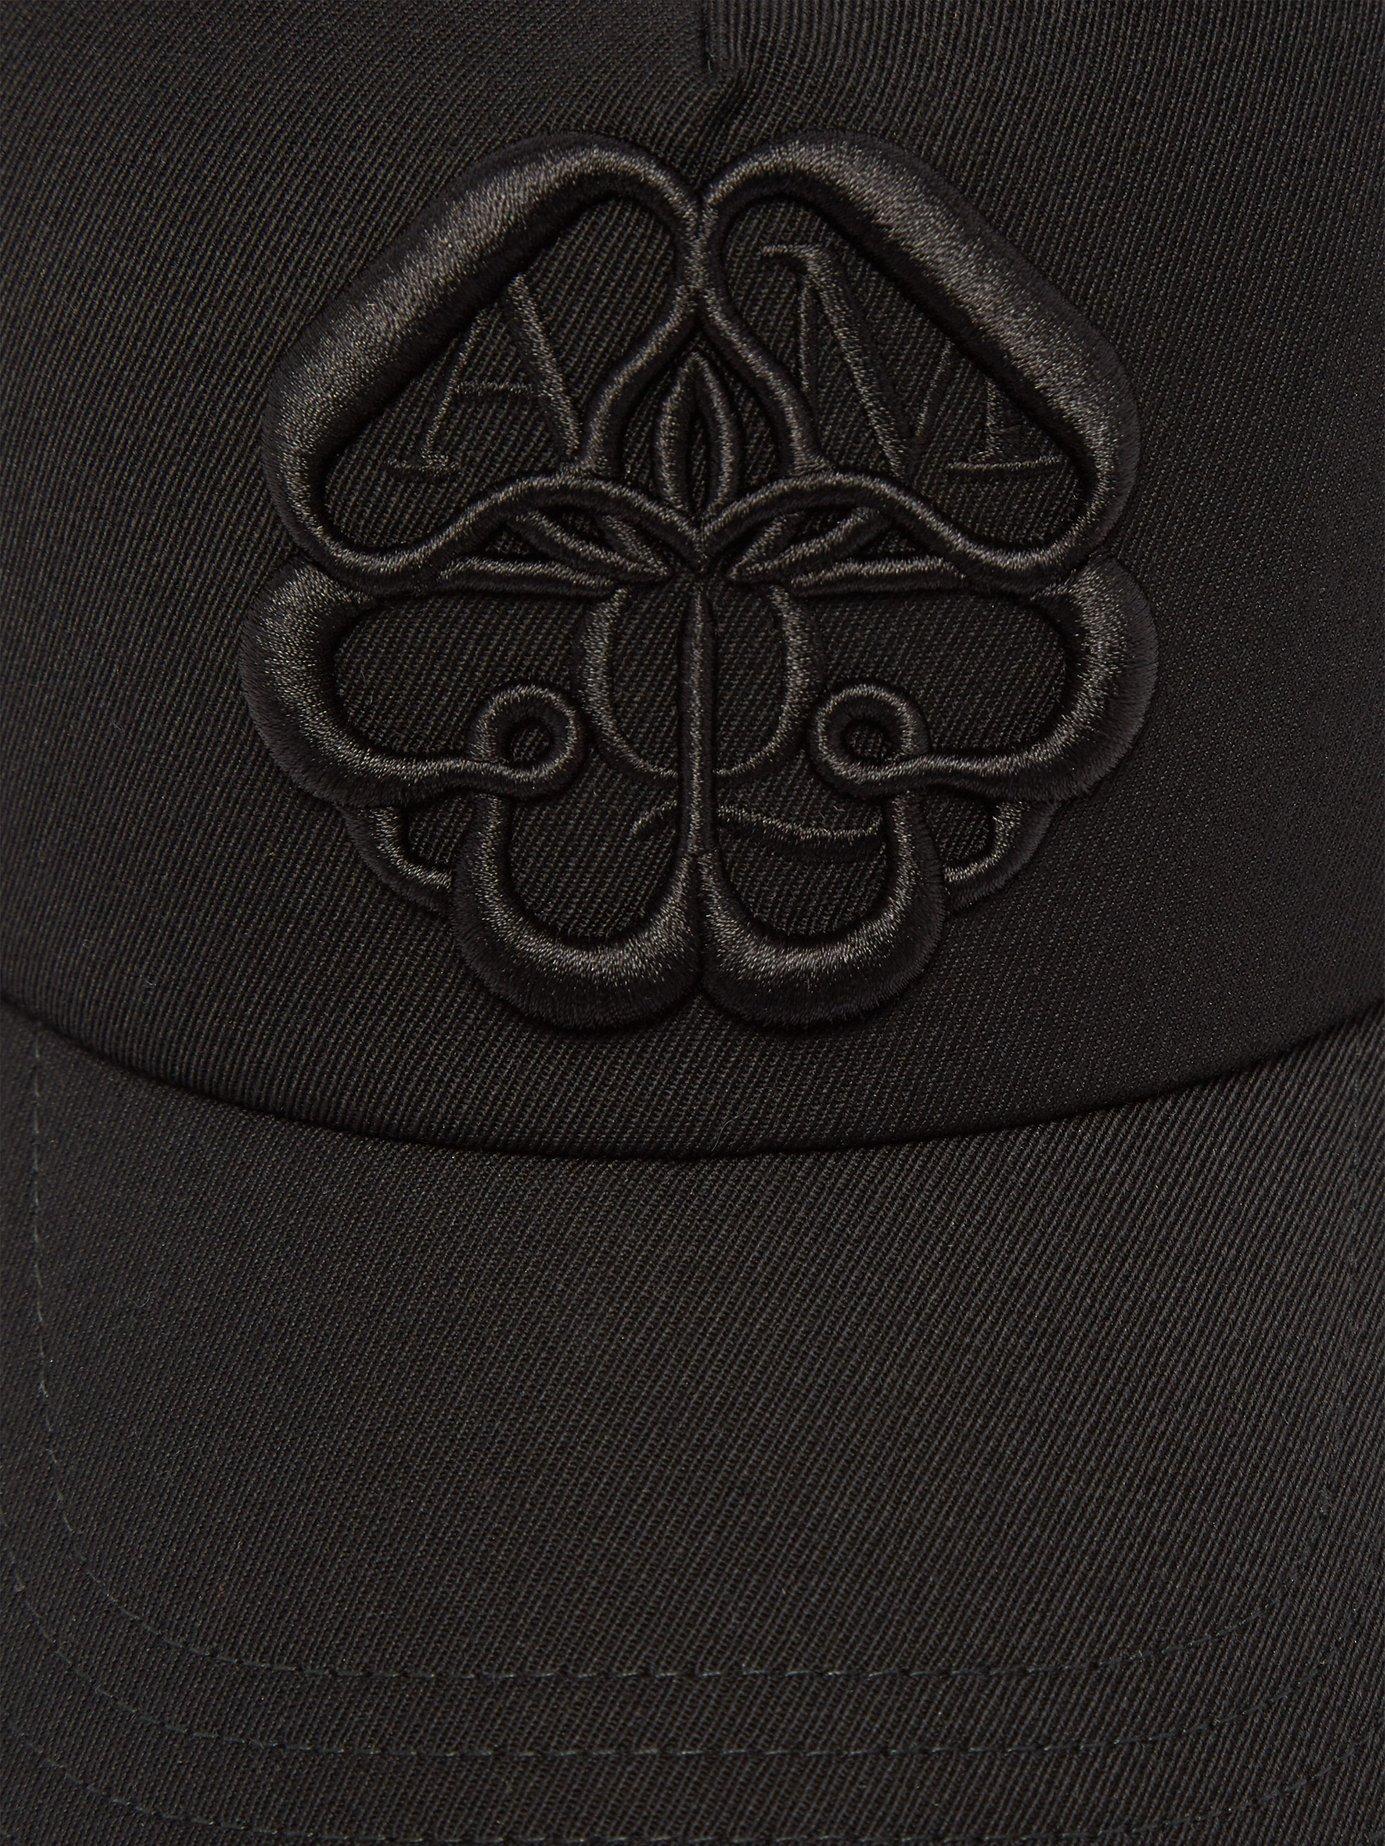 39e56b6b724 Alexander McQueen - Black Logo Embroidered Lather Panelled Cotton Cap for  Men - Lyst. View fullscreen